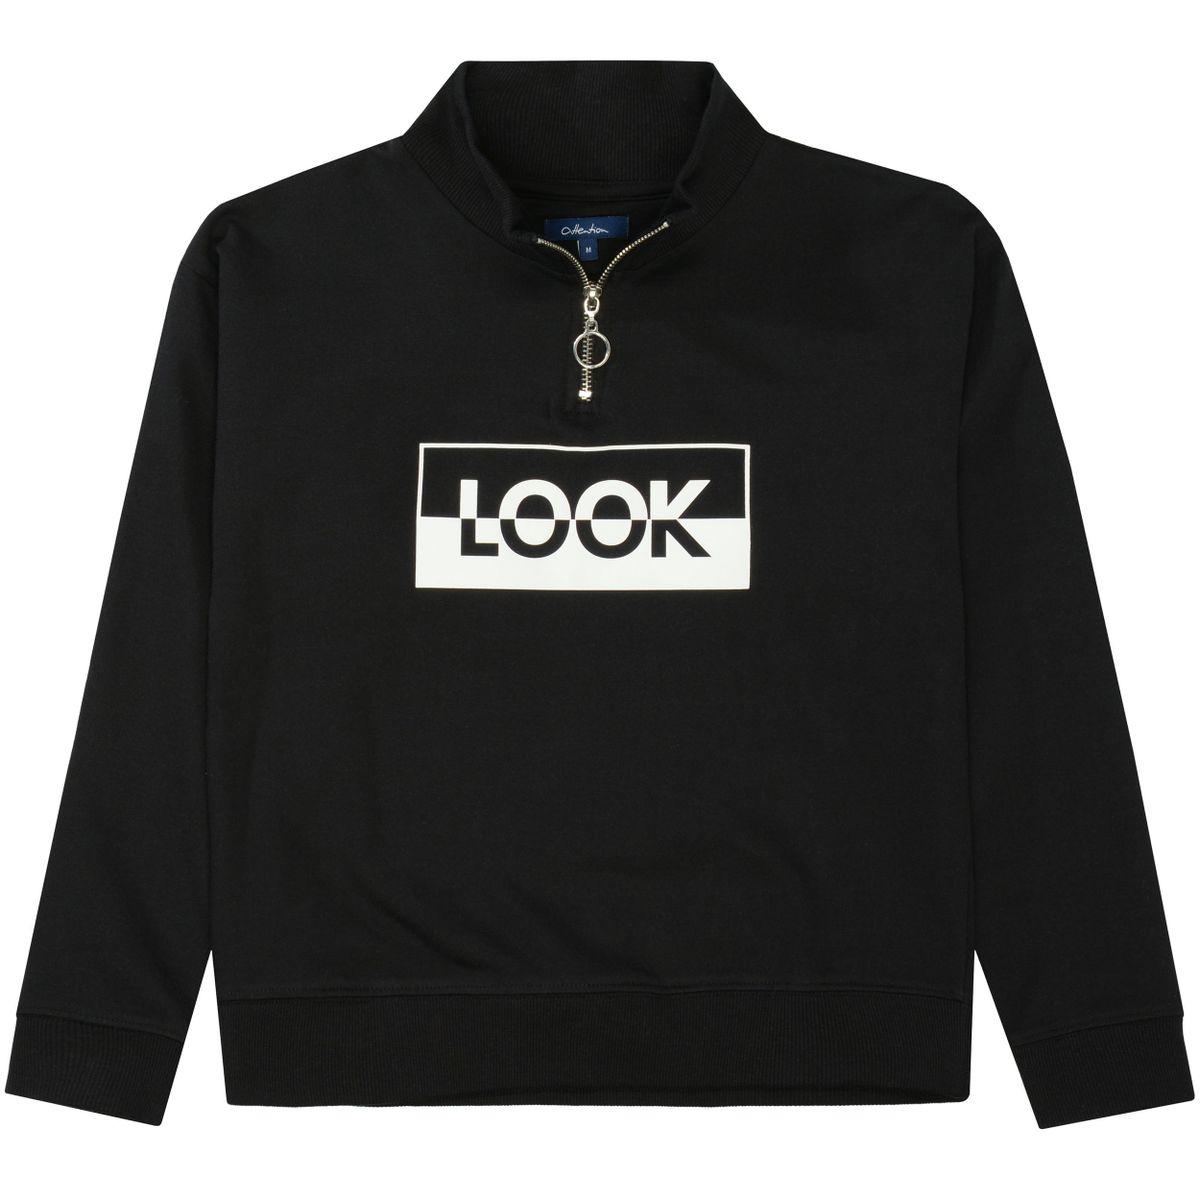 ATTENTION Sweatshirt LOOK - Black